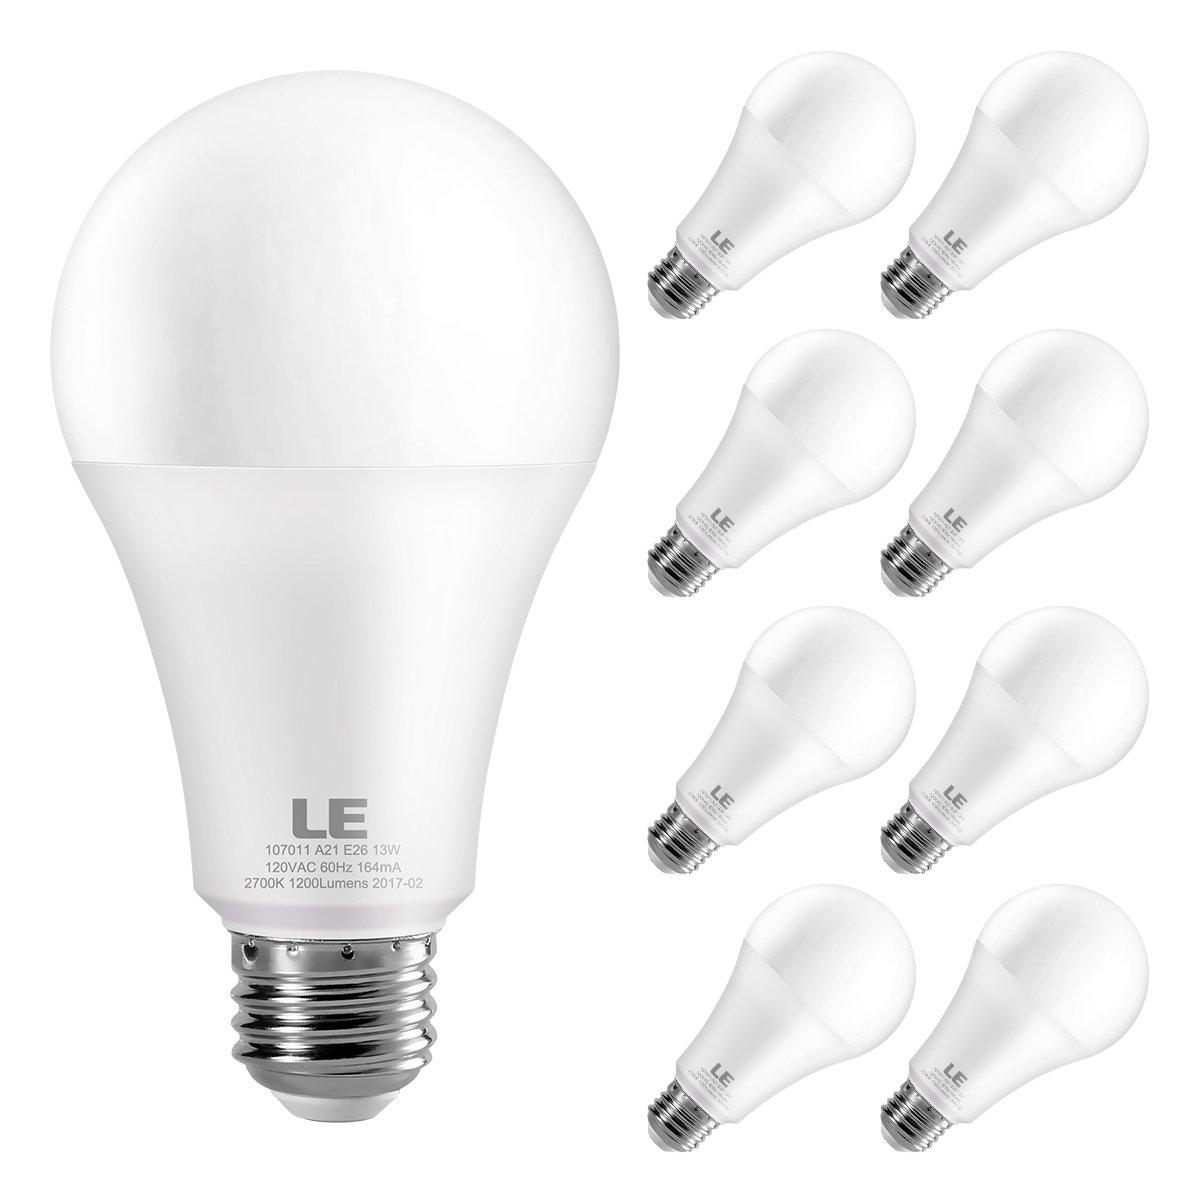 Led Incandescent Output2700k Light A21 Medium LumensHigh 1200 Warm Le BulbReplacement WhiteE26 Watt BaseFrostedBig For 100w 13 Soft 3RLq54Acj